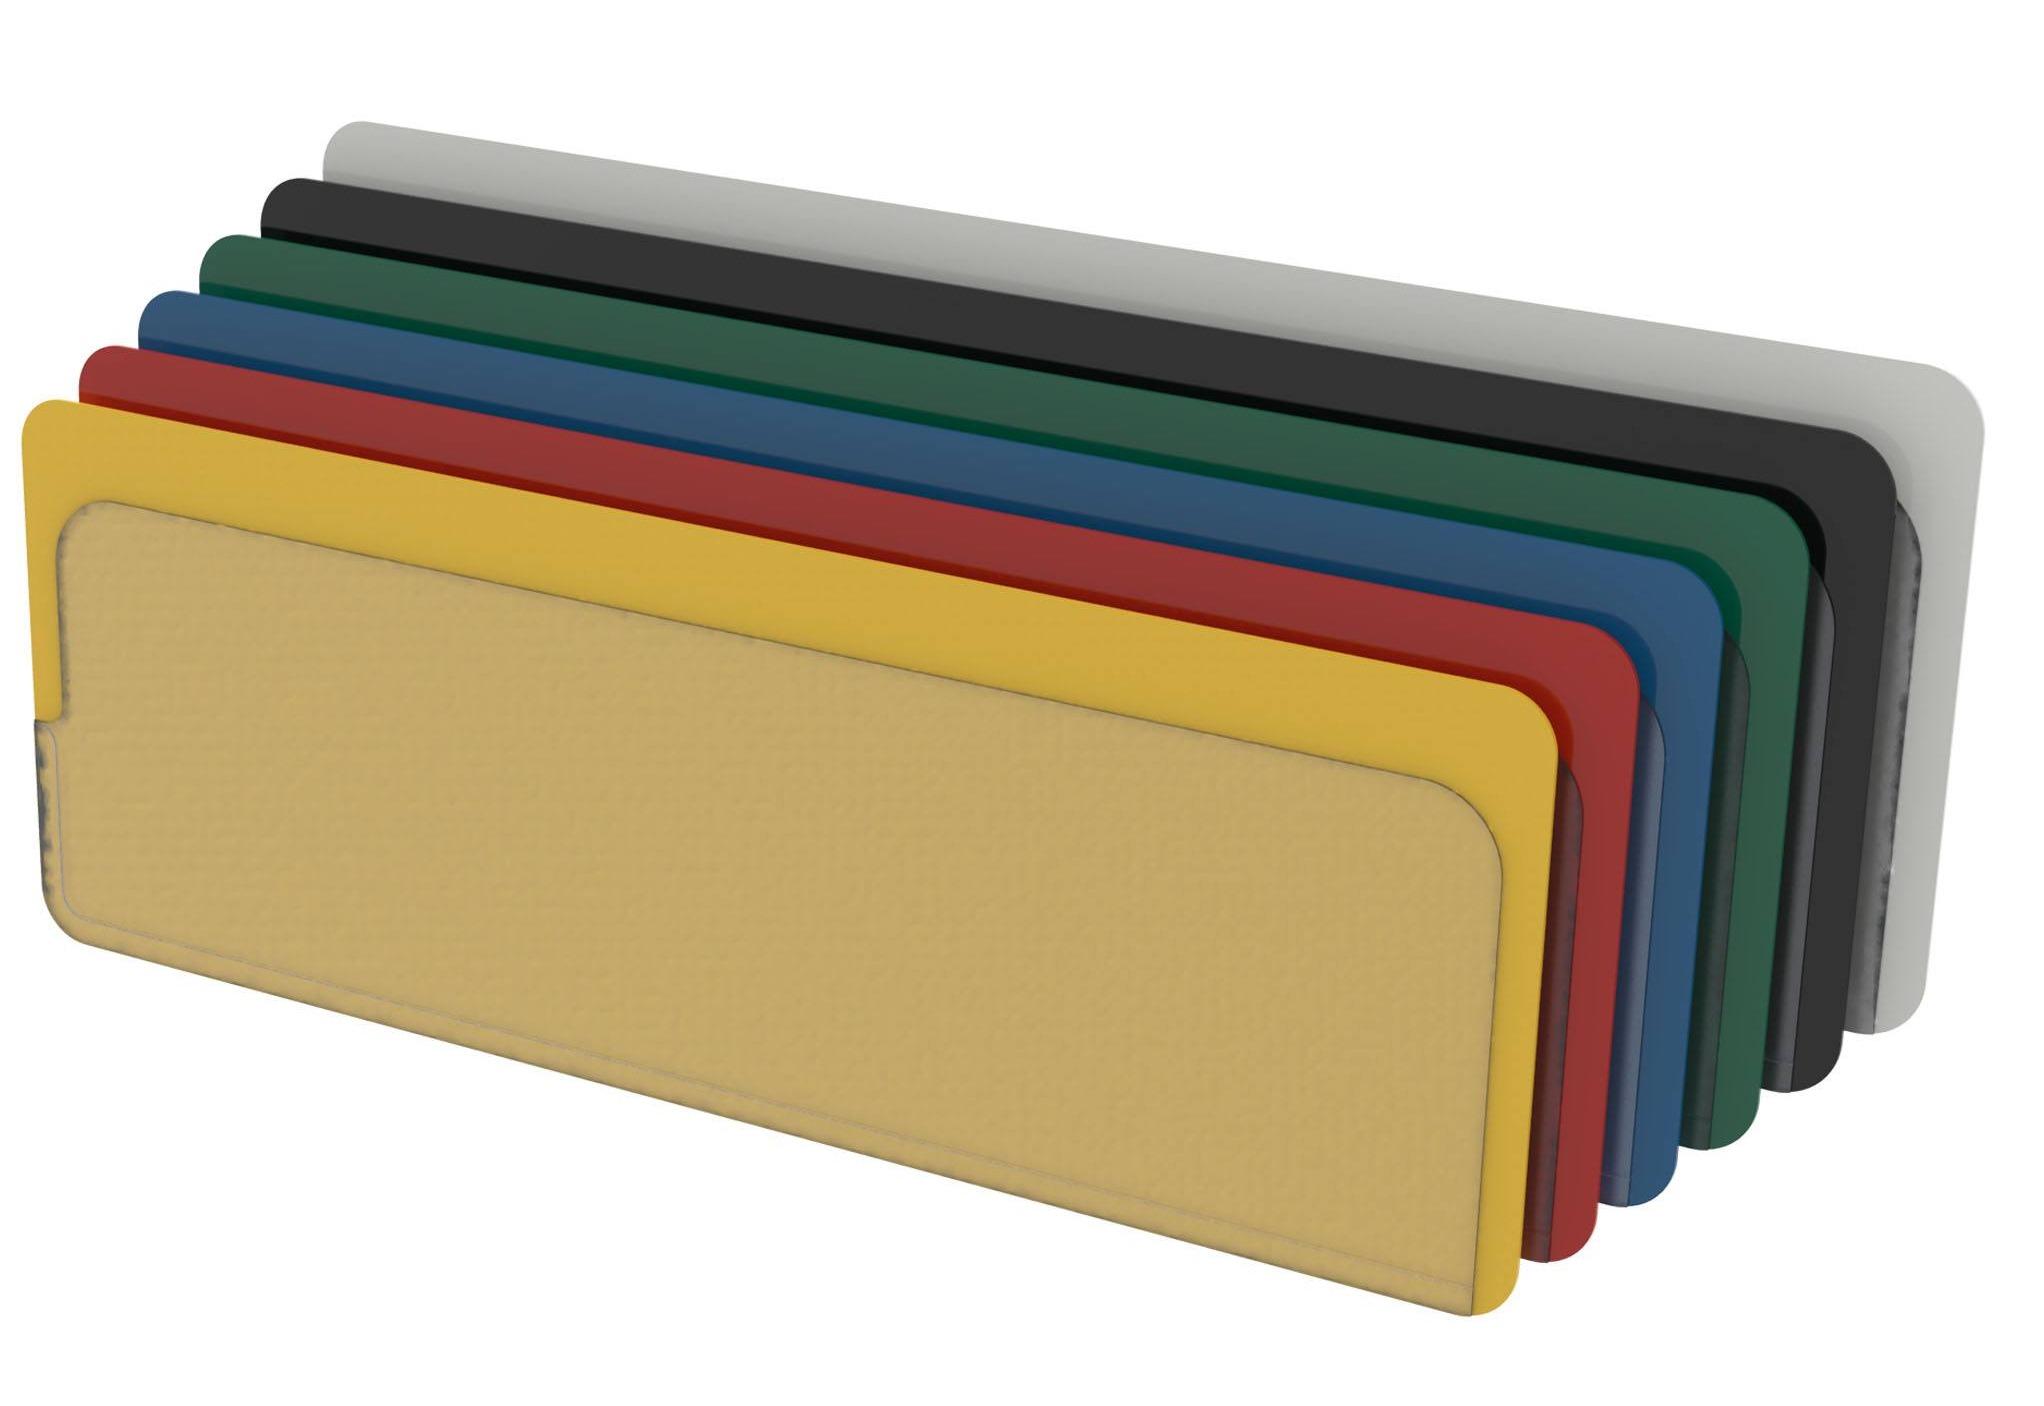 2020-02-21-FATH-pp-shelf-labelings-2-2048x2048-8-wo